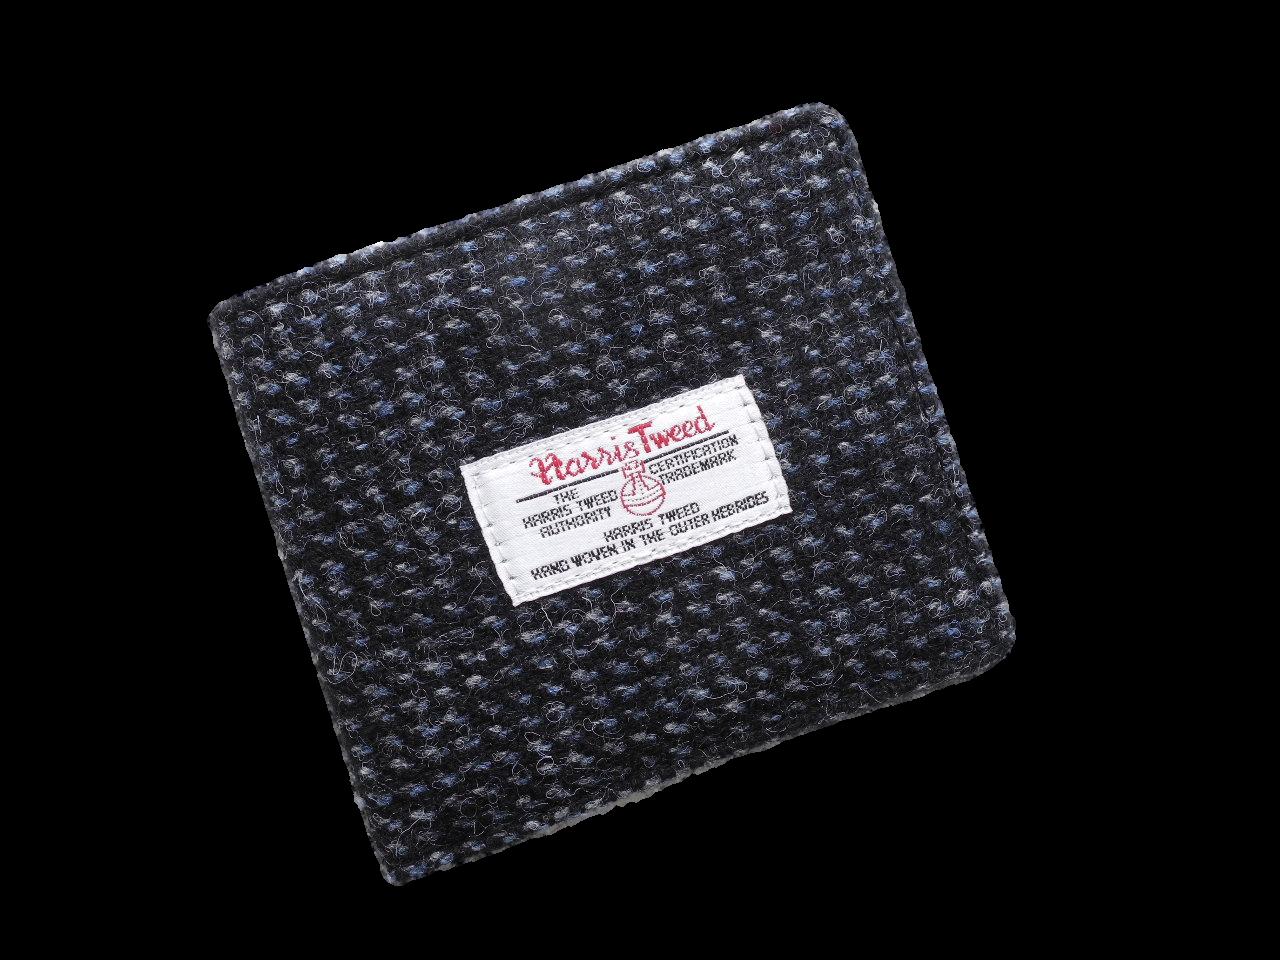 scottish gents wallet harris tweed check black grey check